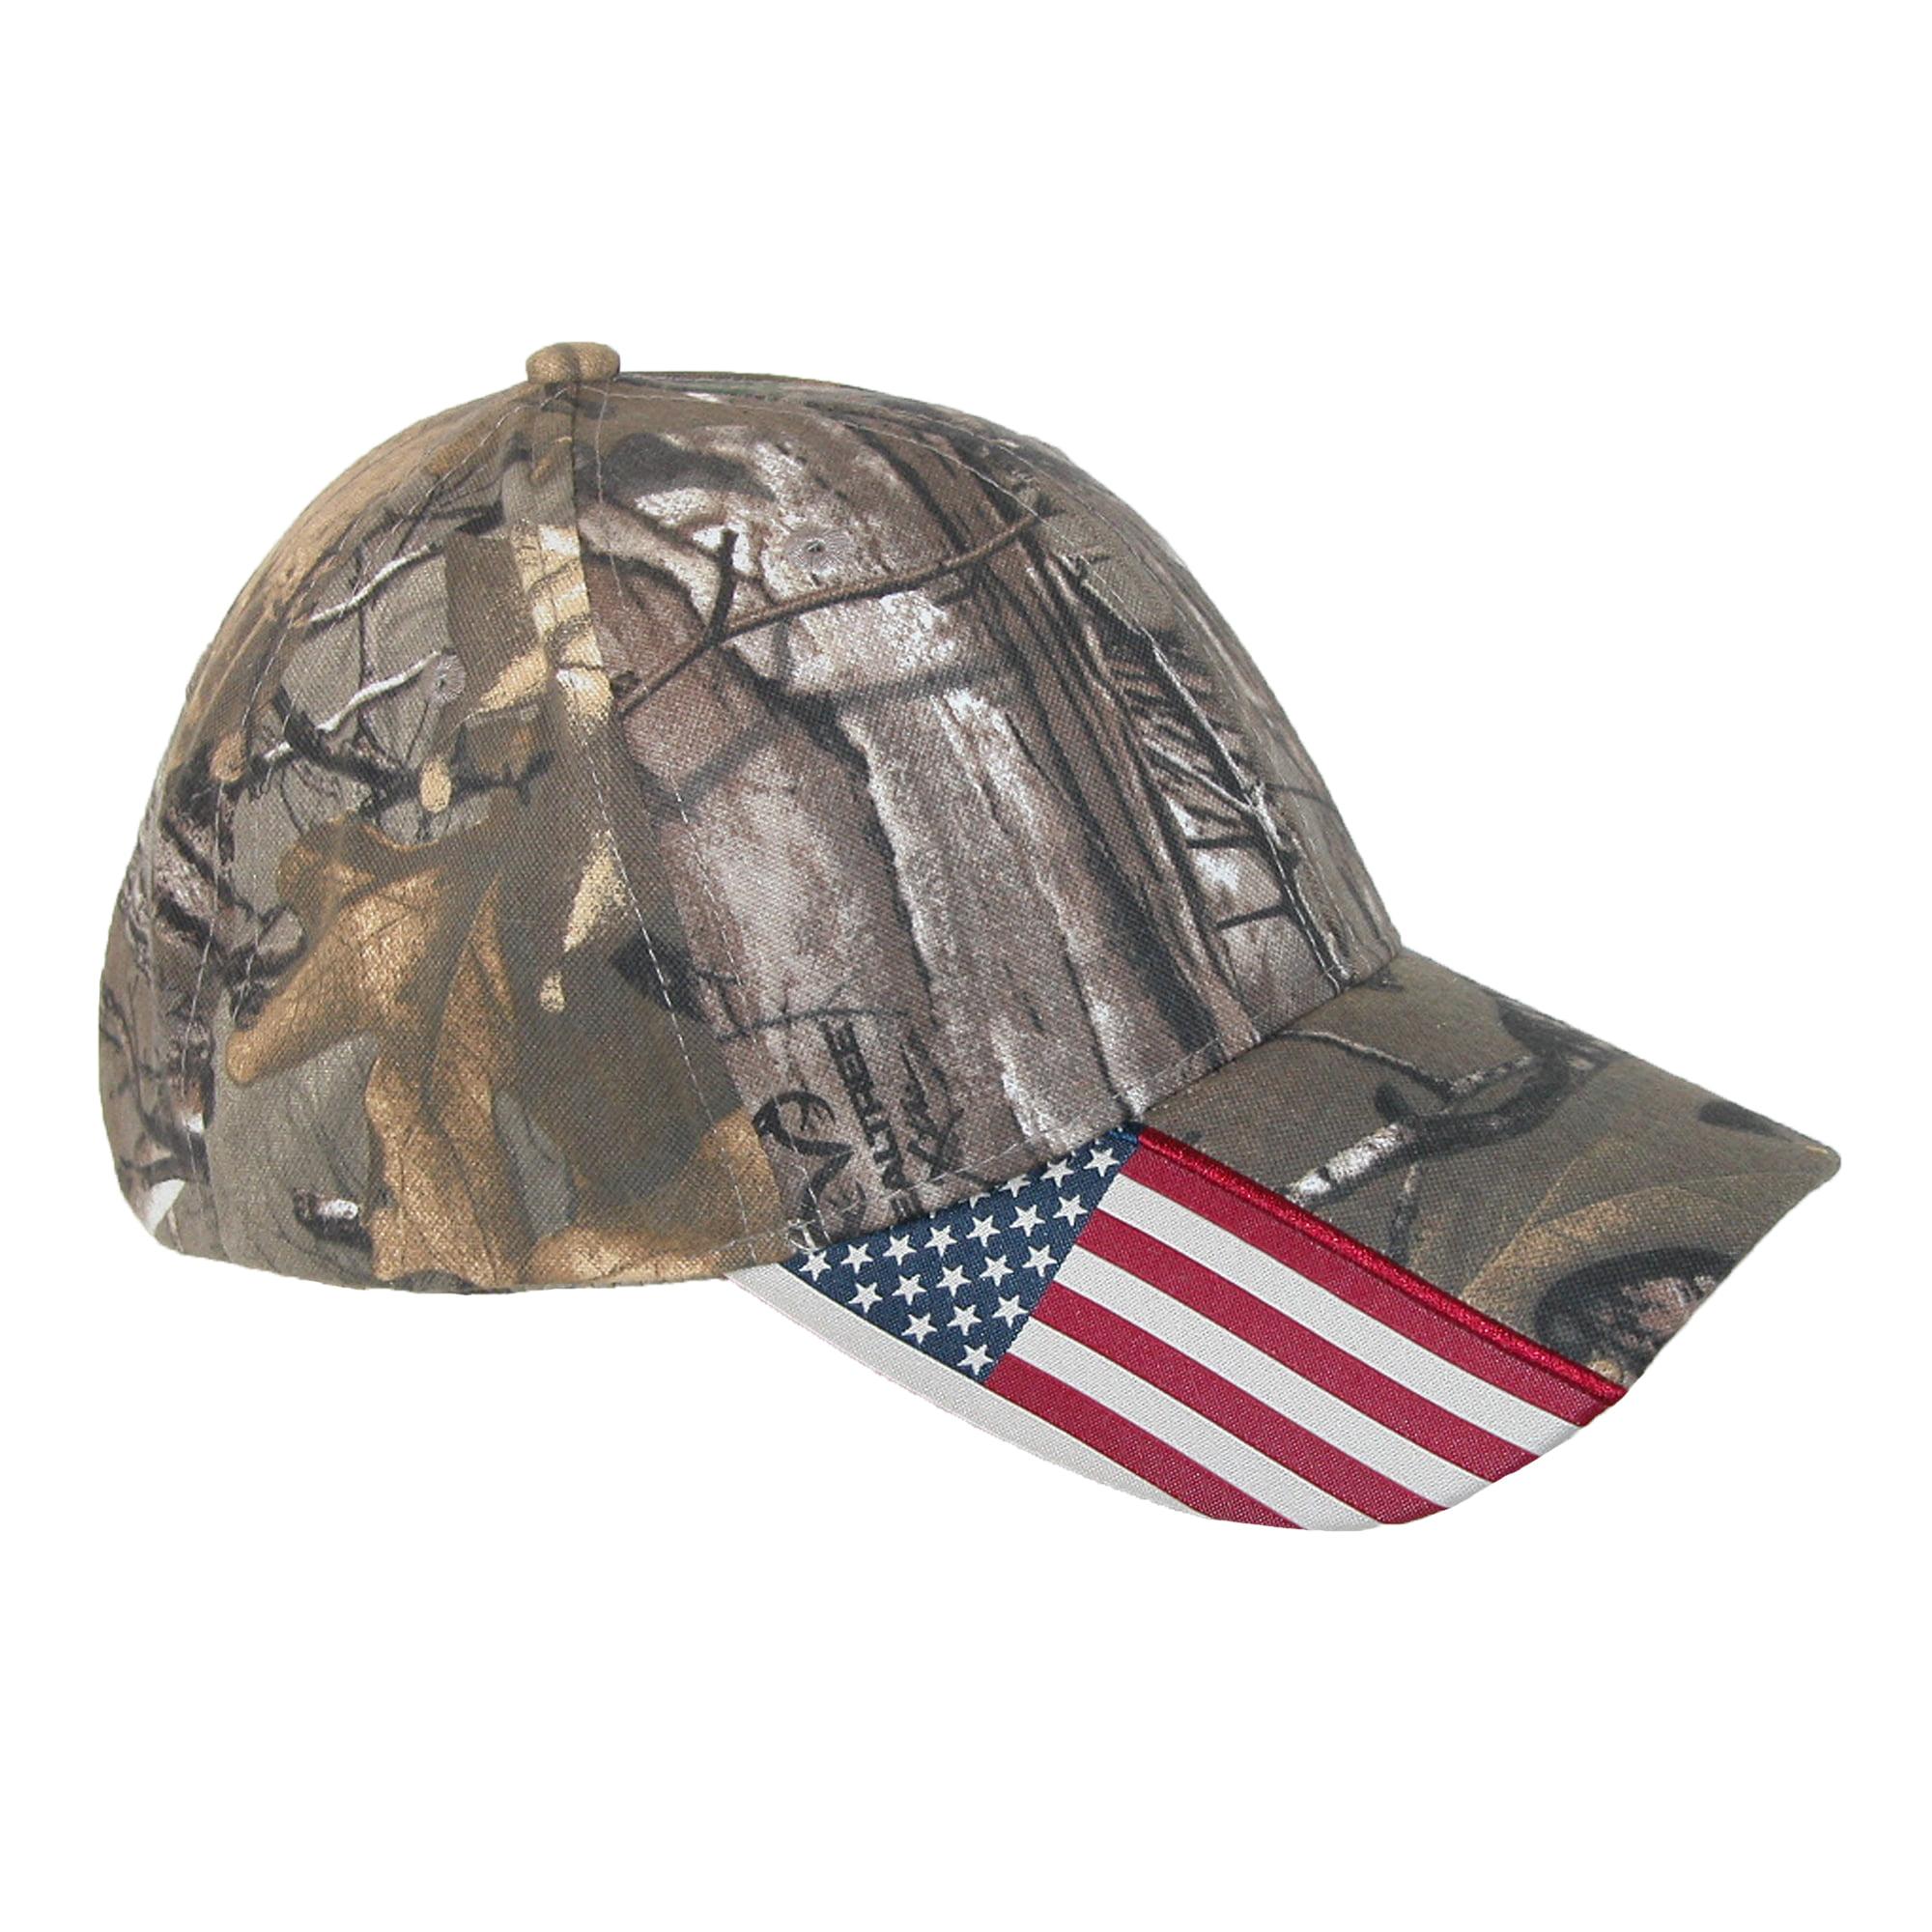 Realtree Xtra Camo and American Flag Baseball Hat by Realtree